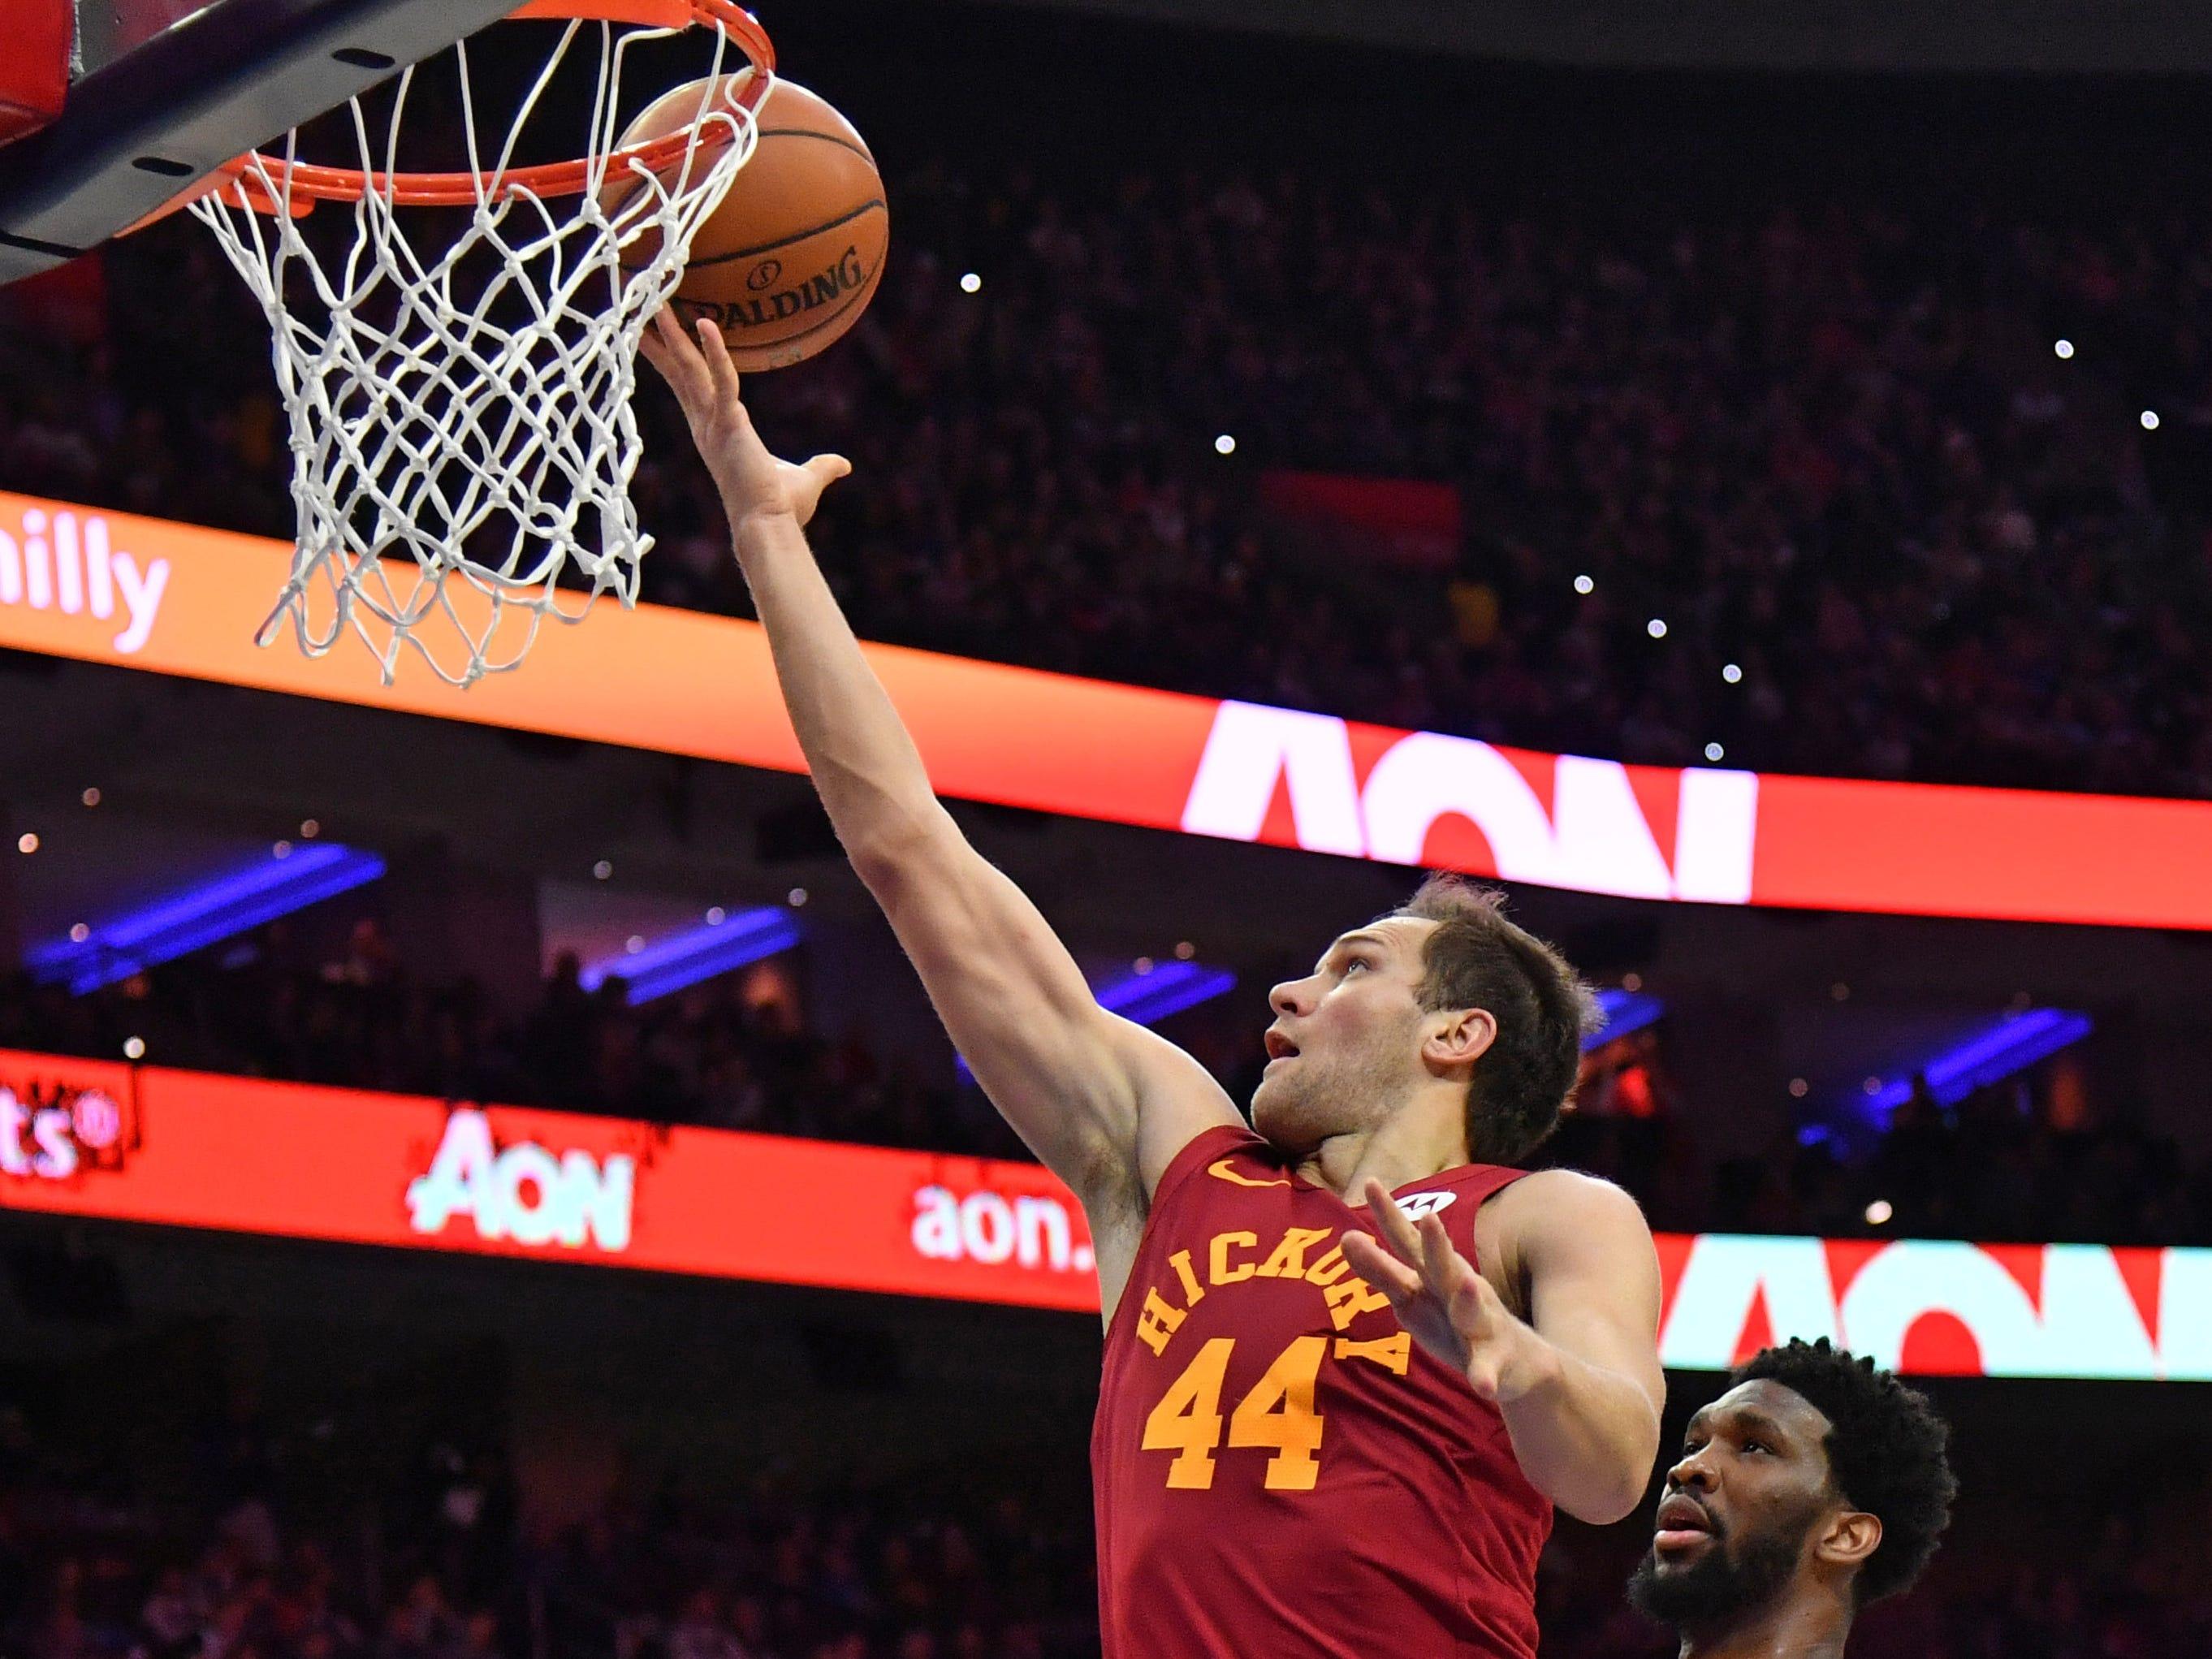 Mar 10, 2019; Philadelphia, PA, USA; Indiana Pacers forward Bojan Bogdanovic (44) makes a lay up agaisnt Philadelphia 76ers center Joel Embiid (21) during the second quarter at Wells Fargo Center.